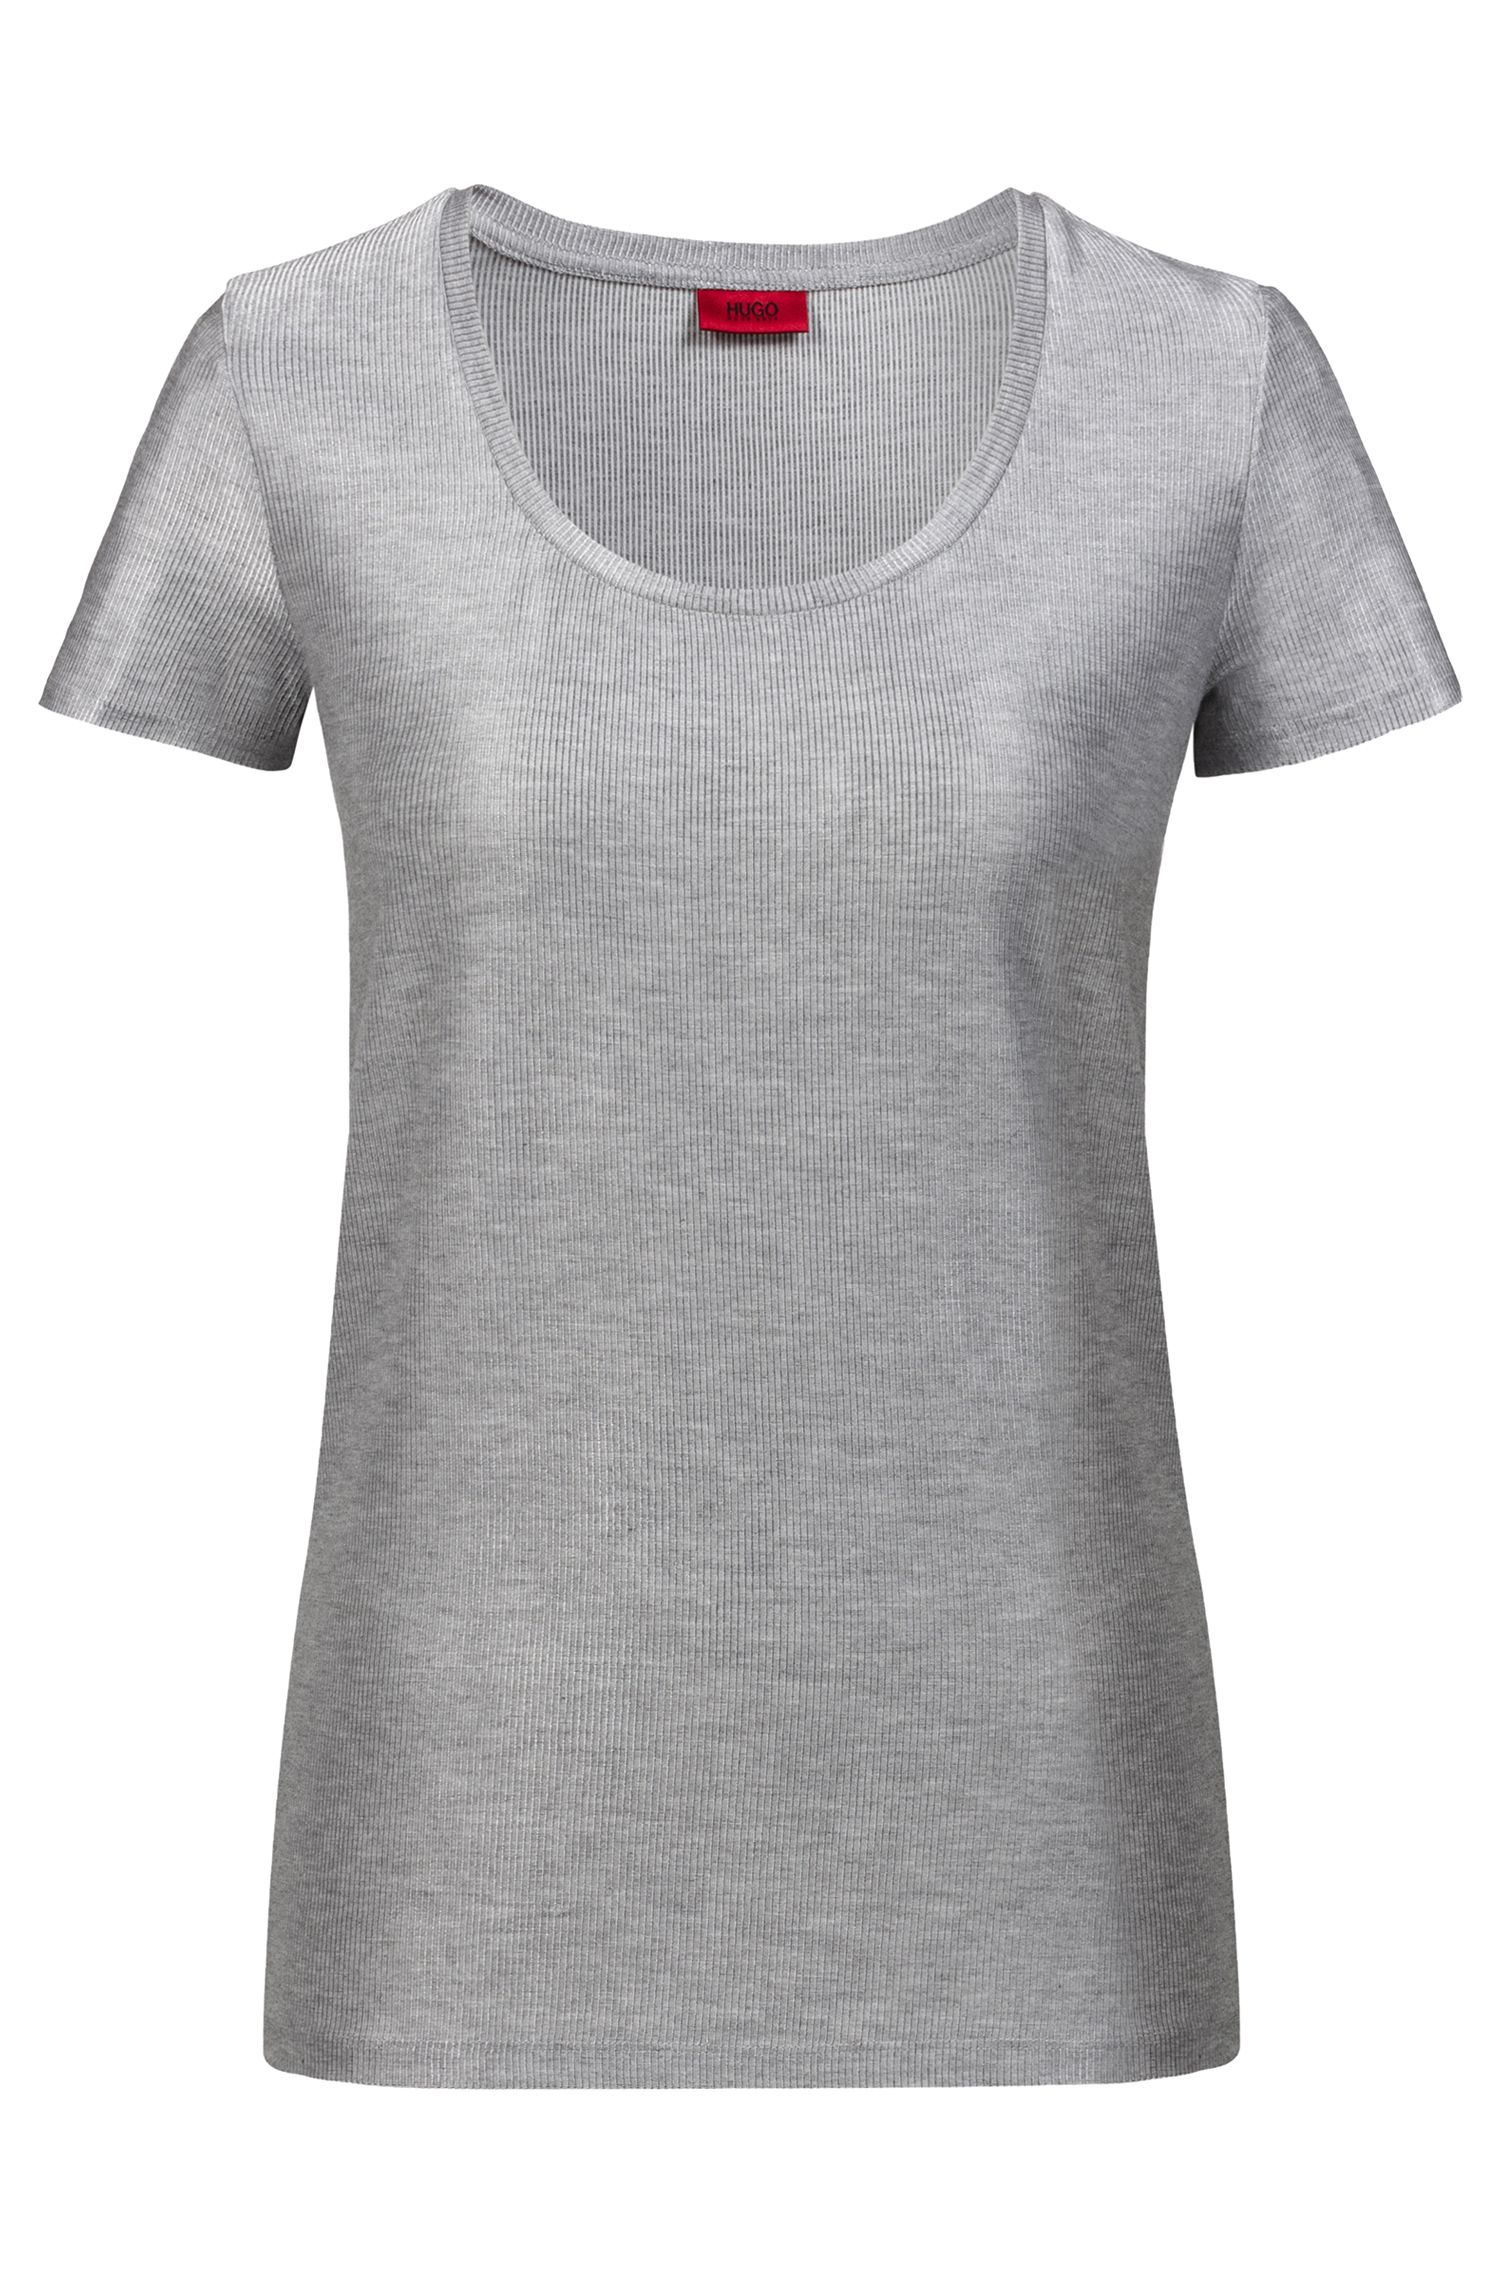 Regular-fit T-shirt in ribbed melange fabric, Silver